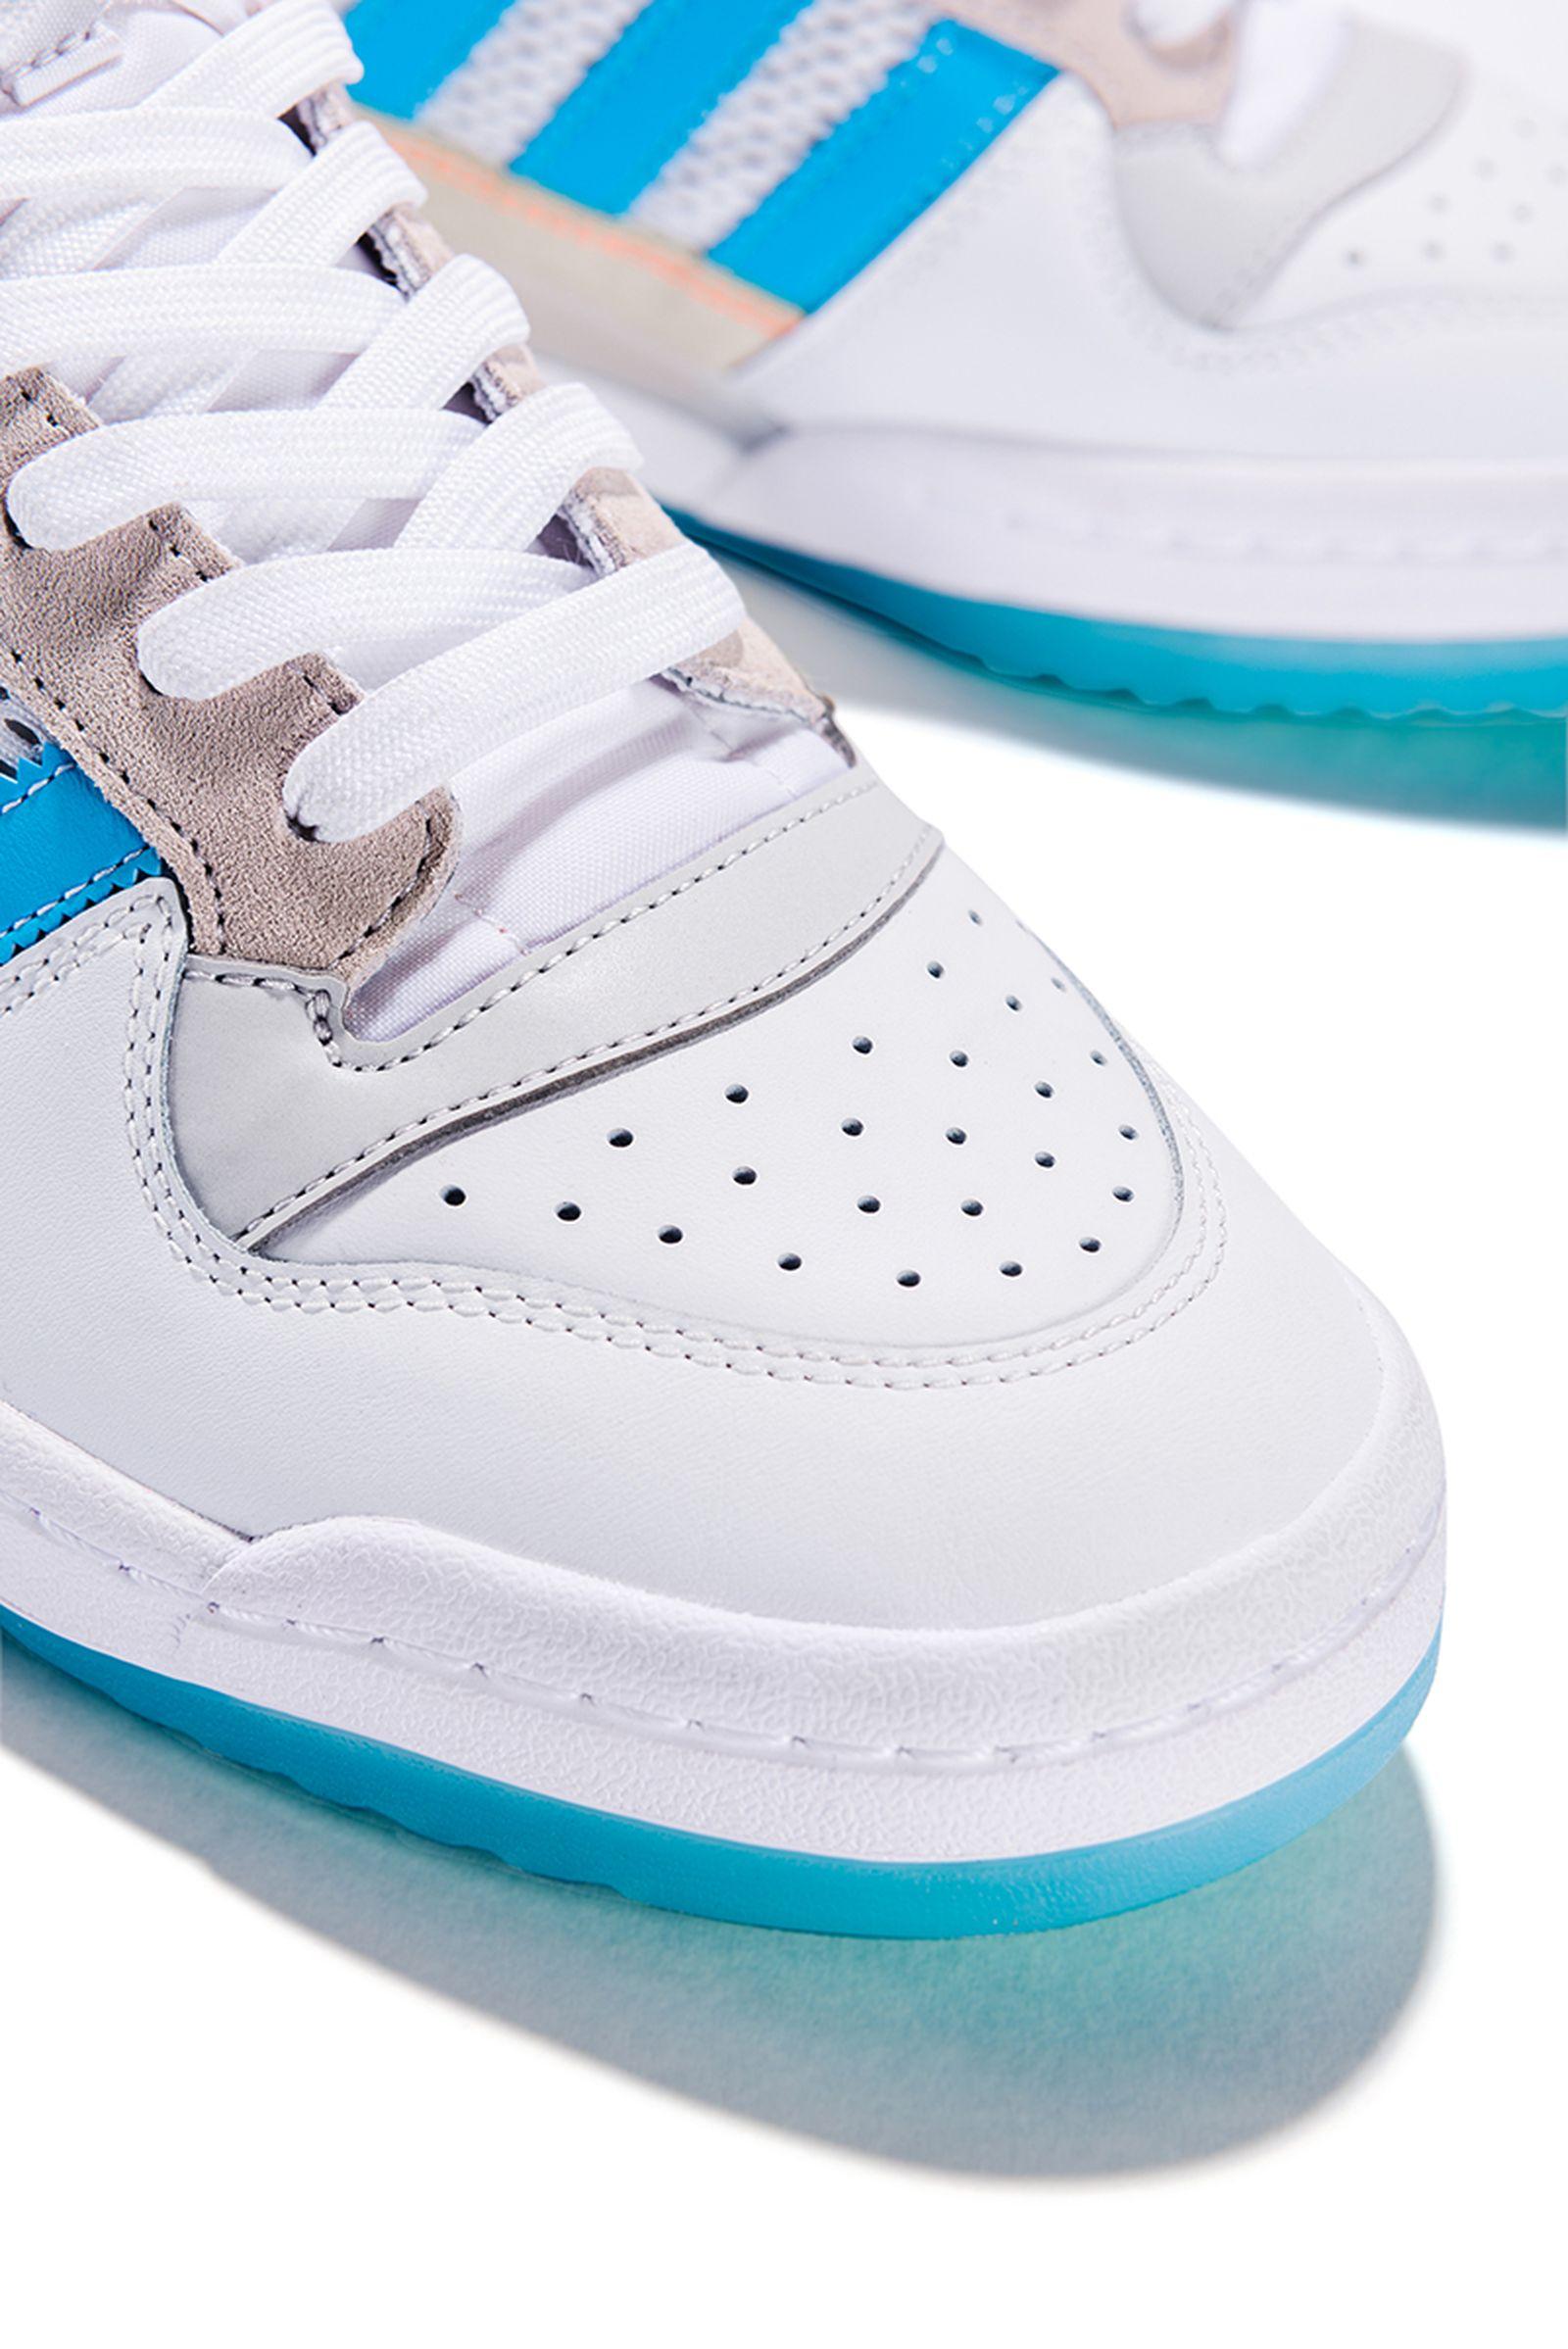 adidas-skateboarding-forum-84-adv-diego-najera-release-date-price-1-04